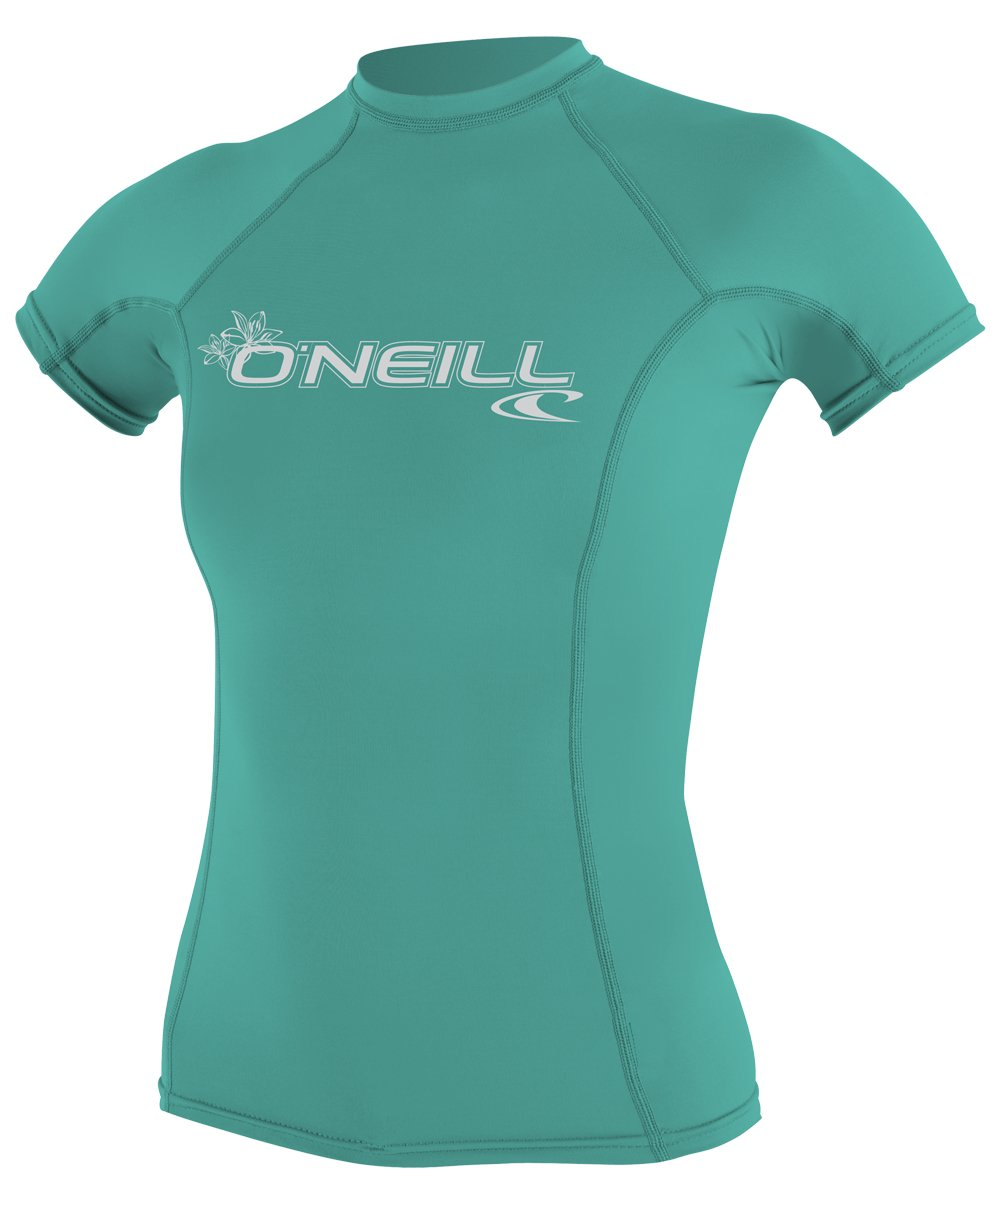 O'Neill Women's Basic 50+ Skins Short Sleeve Rash Guard, Light Aqua, Small by O'Neill Wetsuits